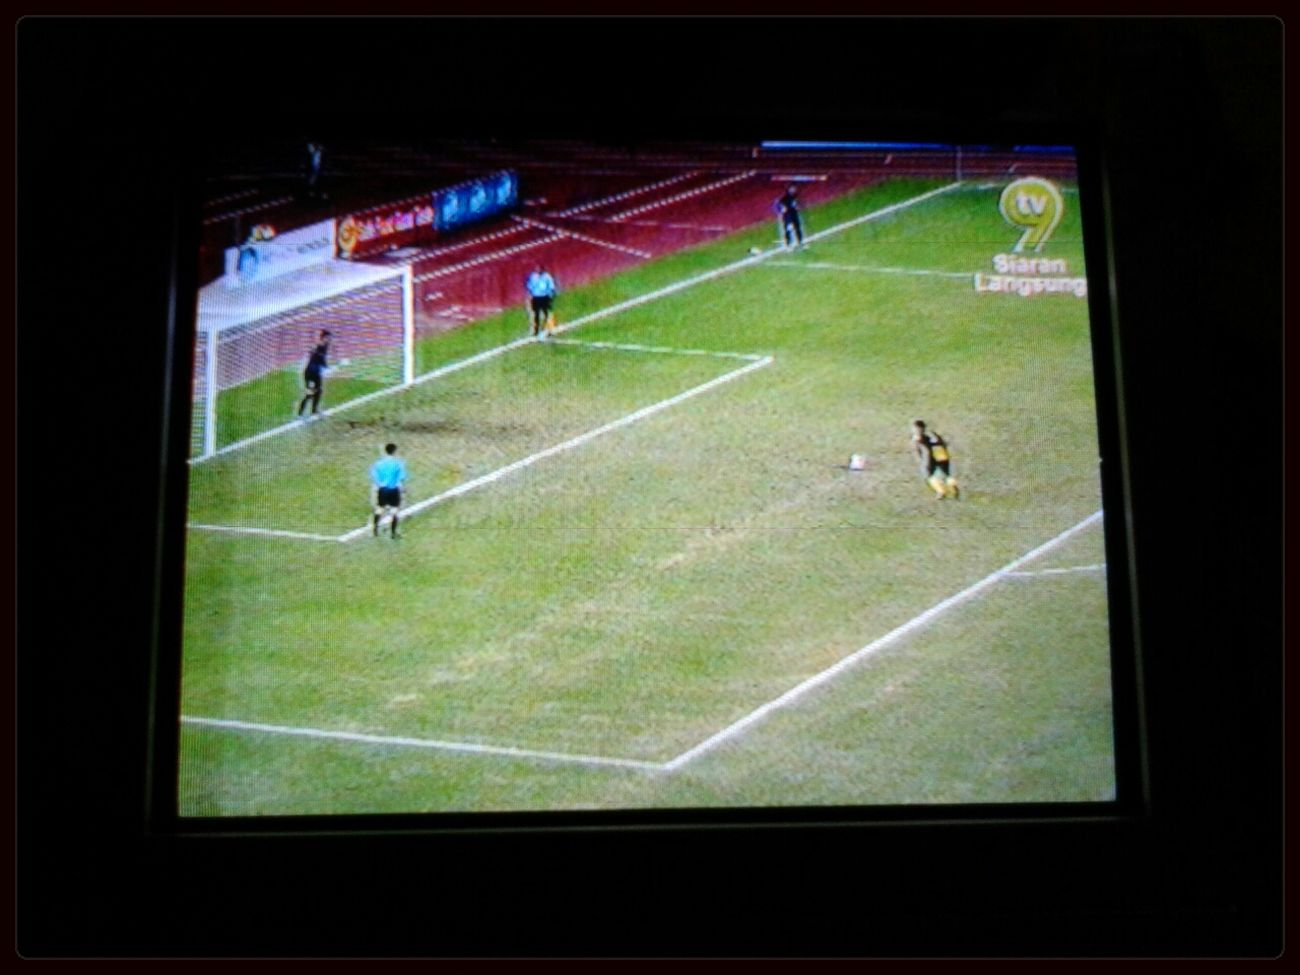 Malaysia 3 4 Indonesia penalti sukansea2013 harimaumuda goodgames